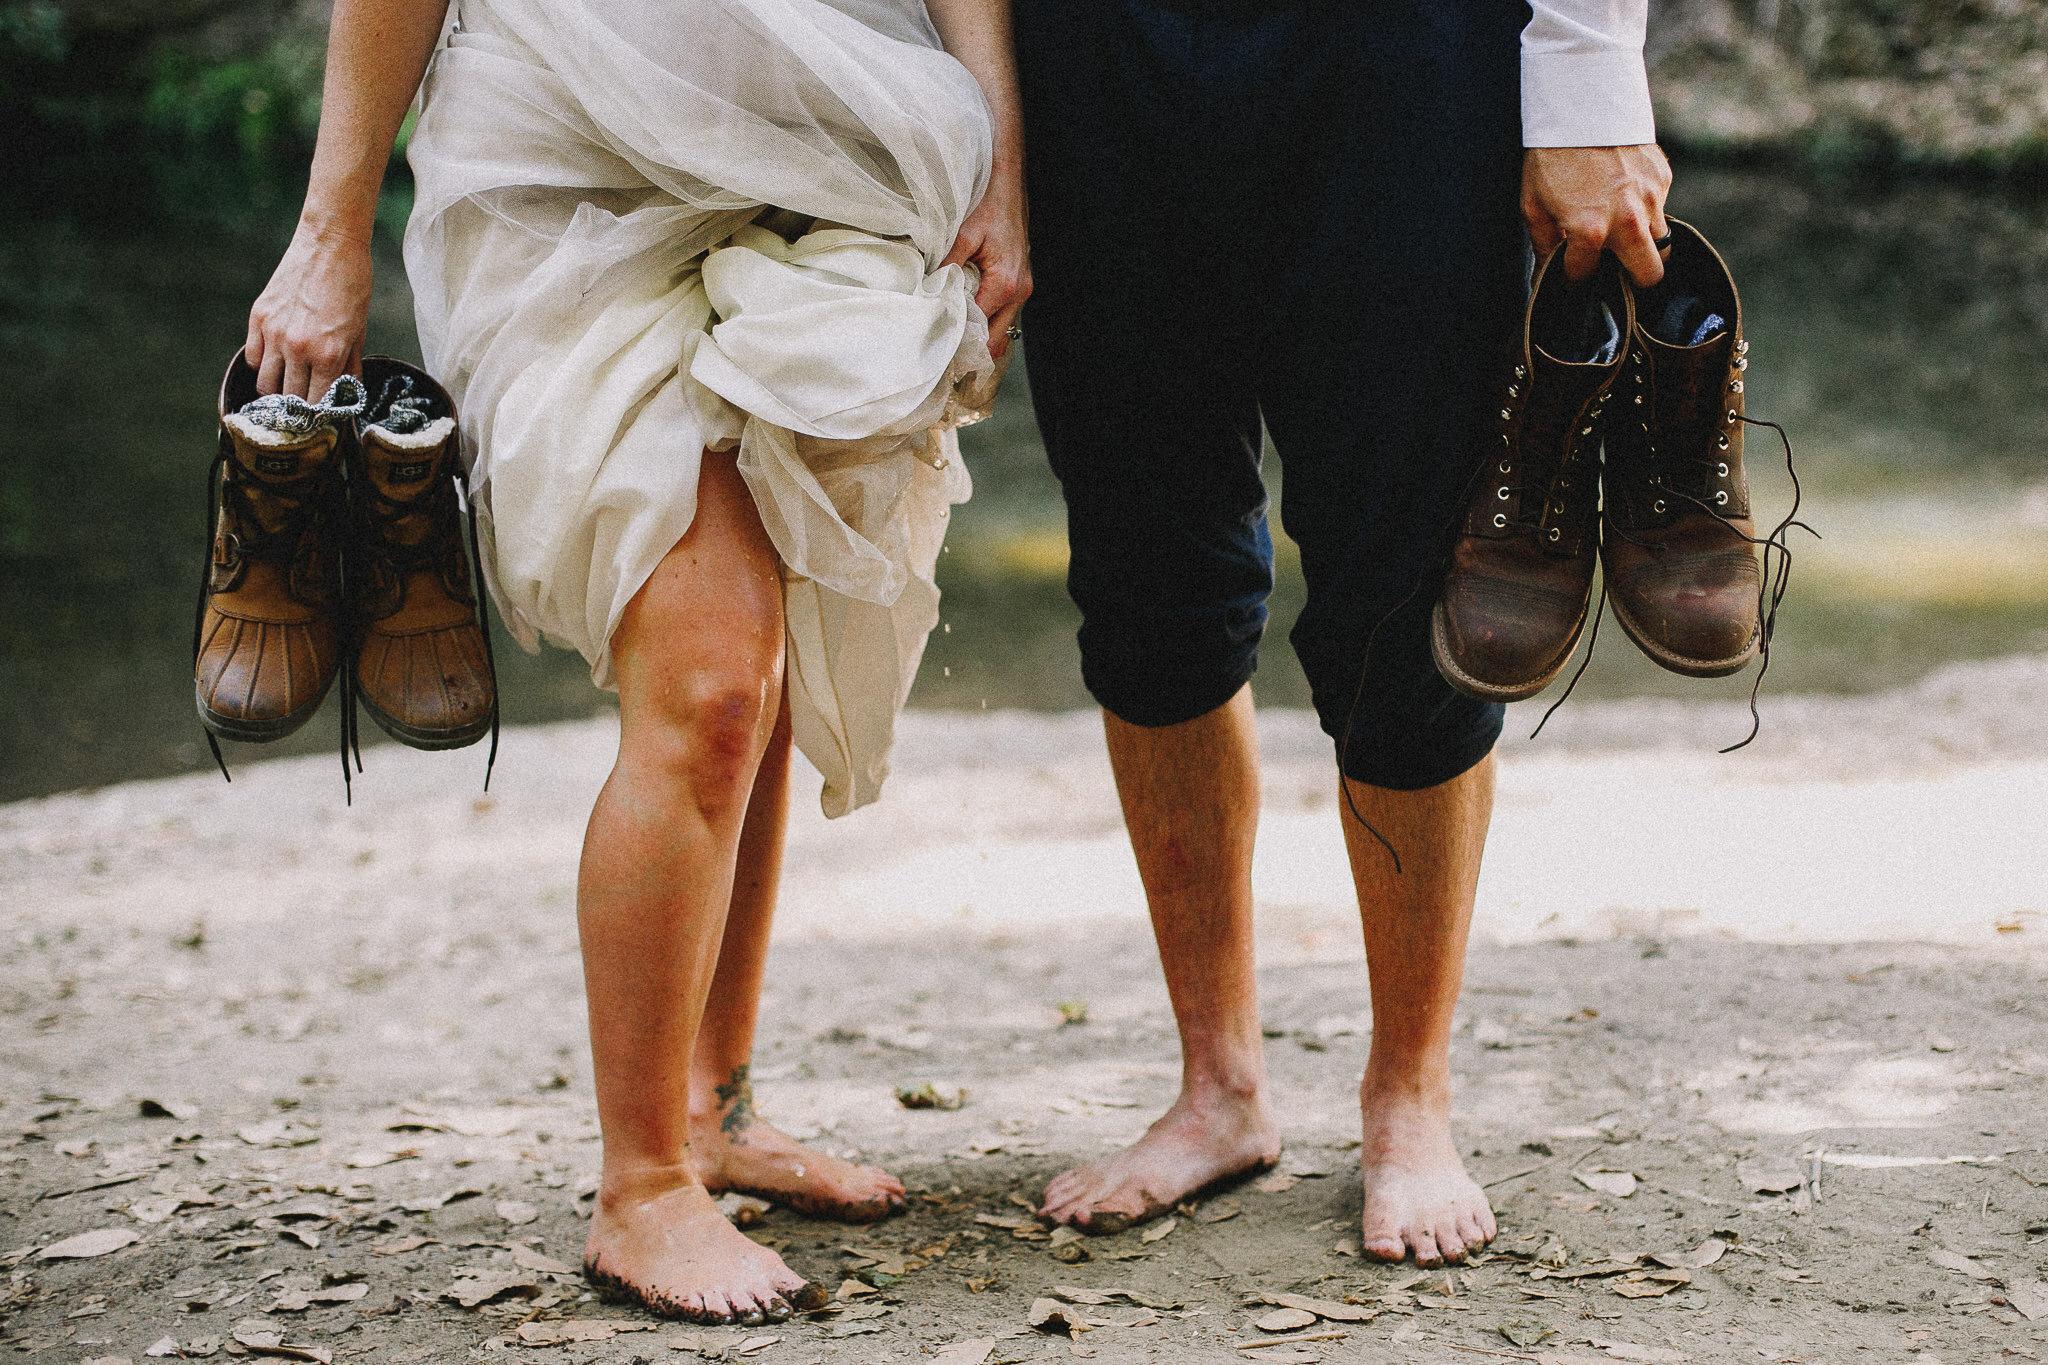 Archer+Inspired+Photography+Couple+in+Water+elopement+Adventure+Travel+Redwoods+OC+Airbnb+Wedding.jpg